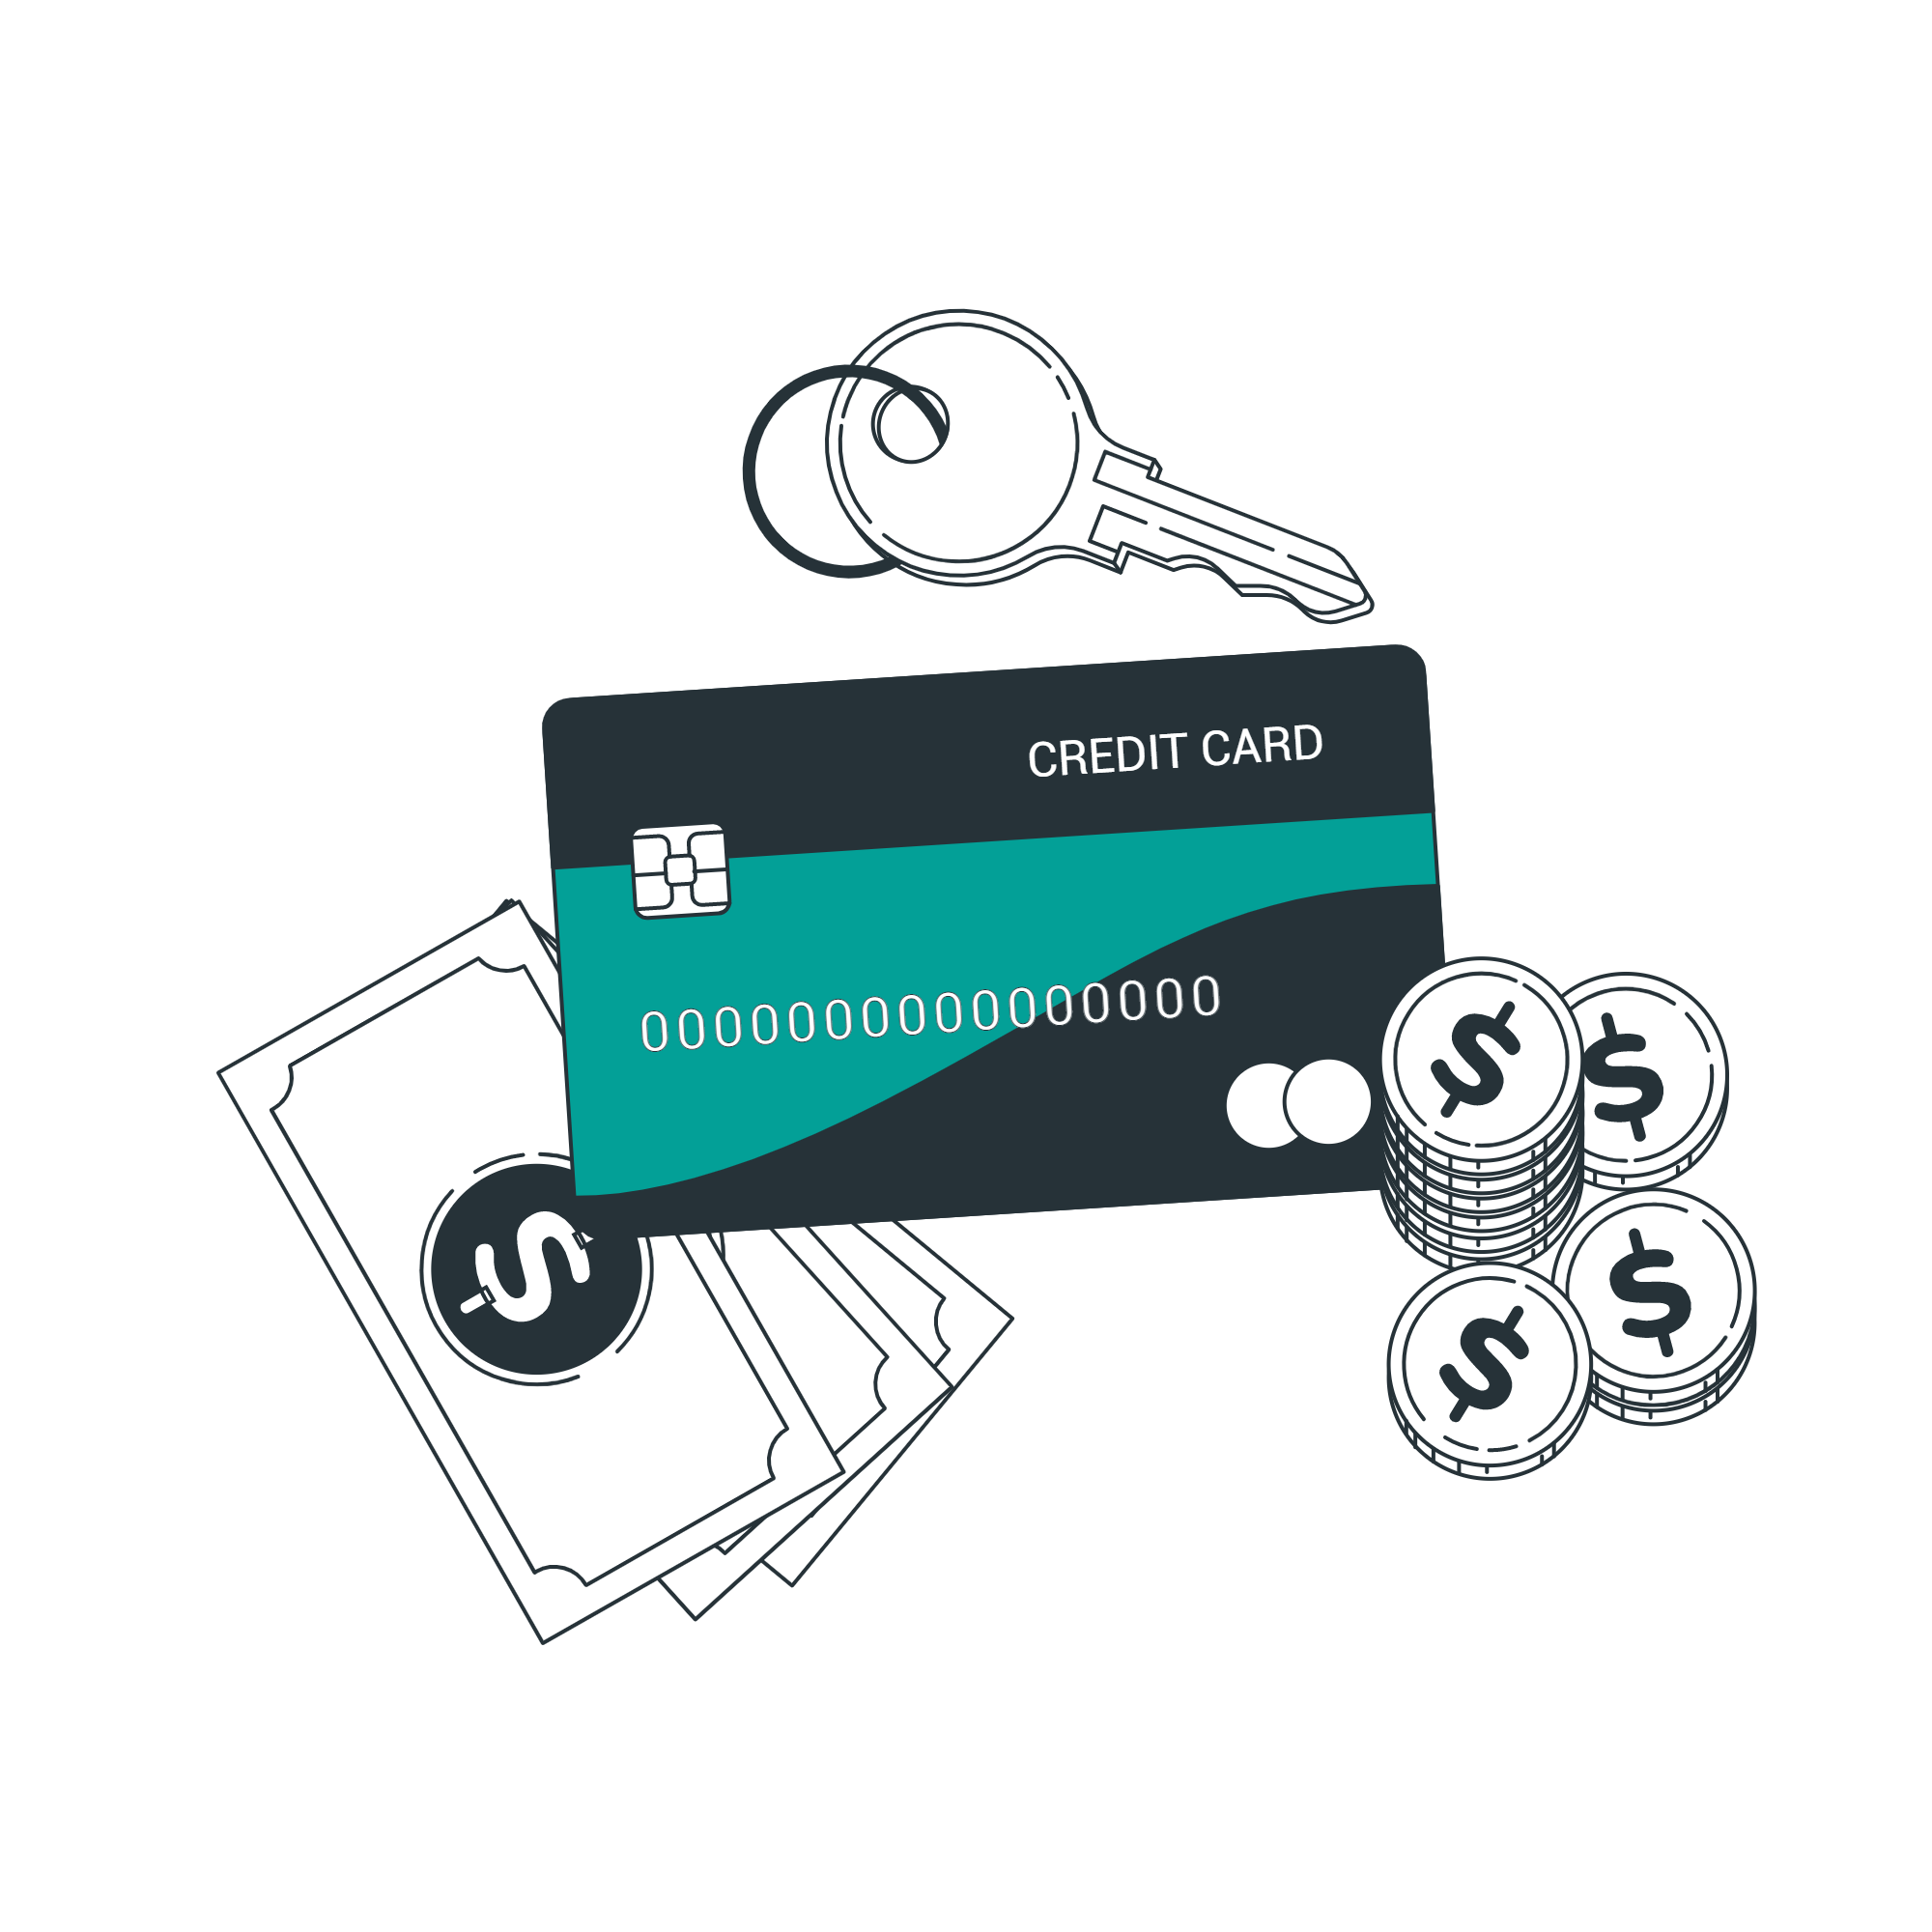 Credit card-bro